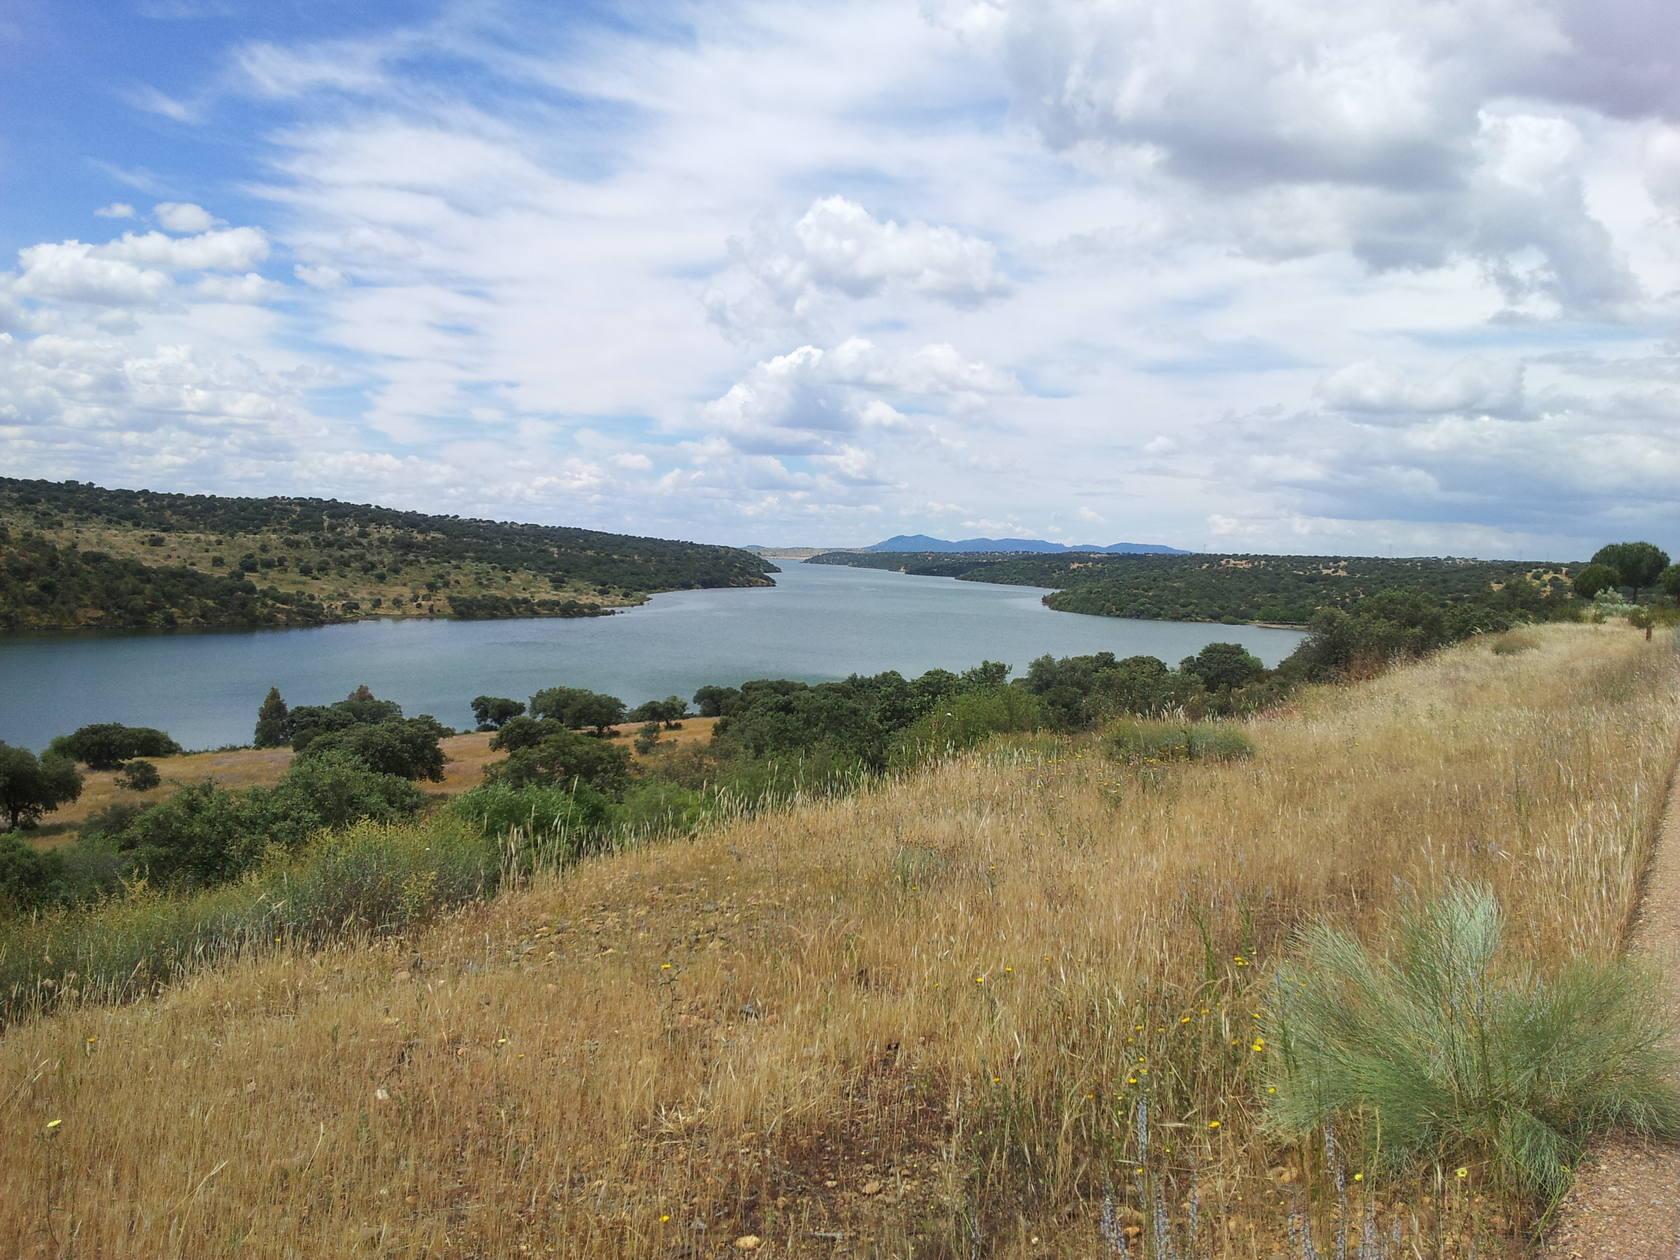 Camino Natural del Guadiana (GR 114)